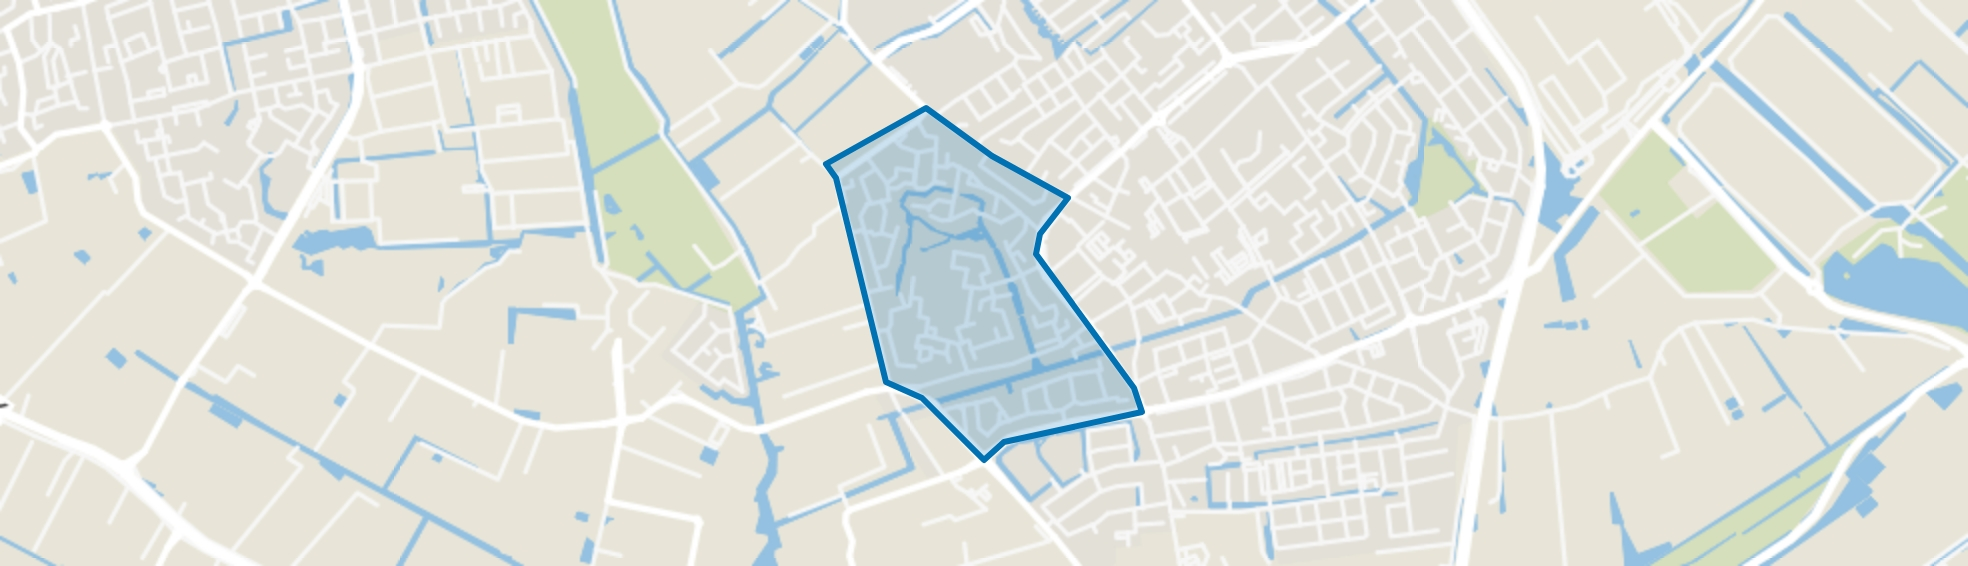 Opstal, Naaldwijk map